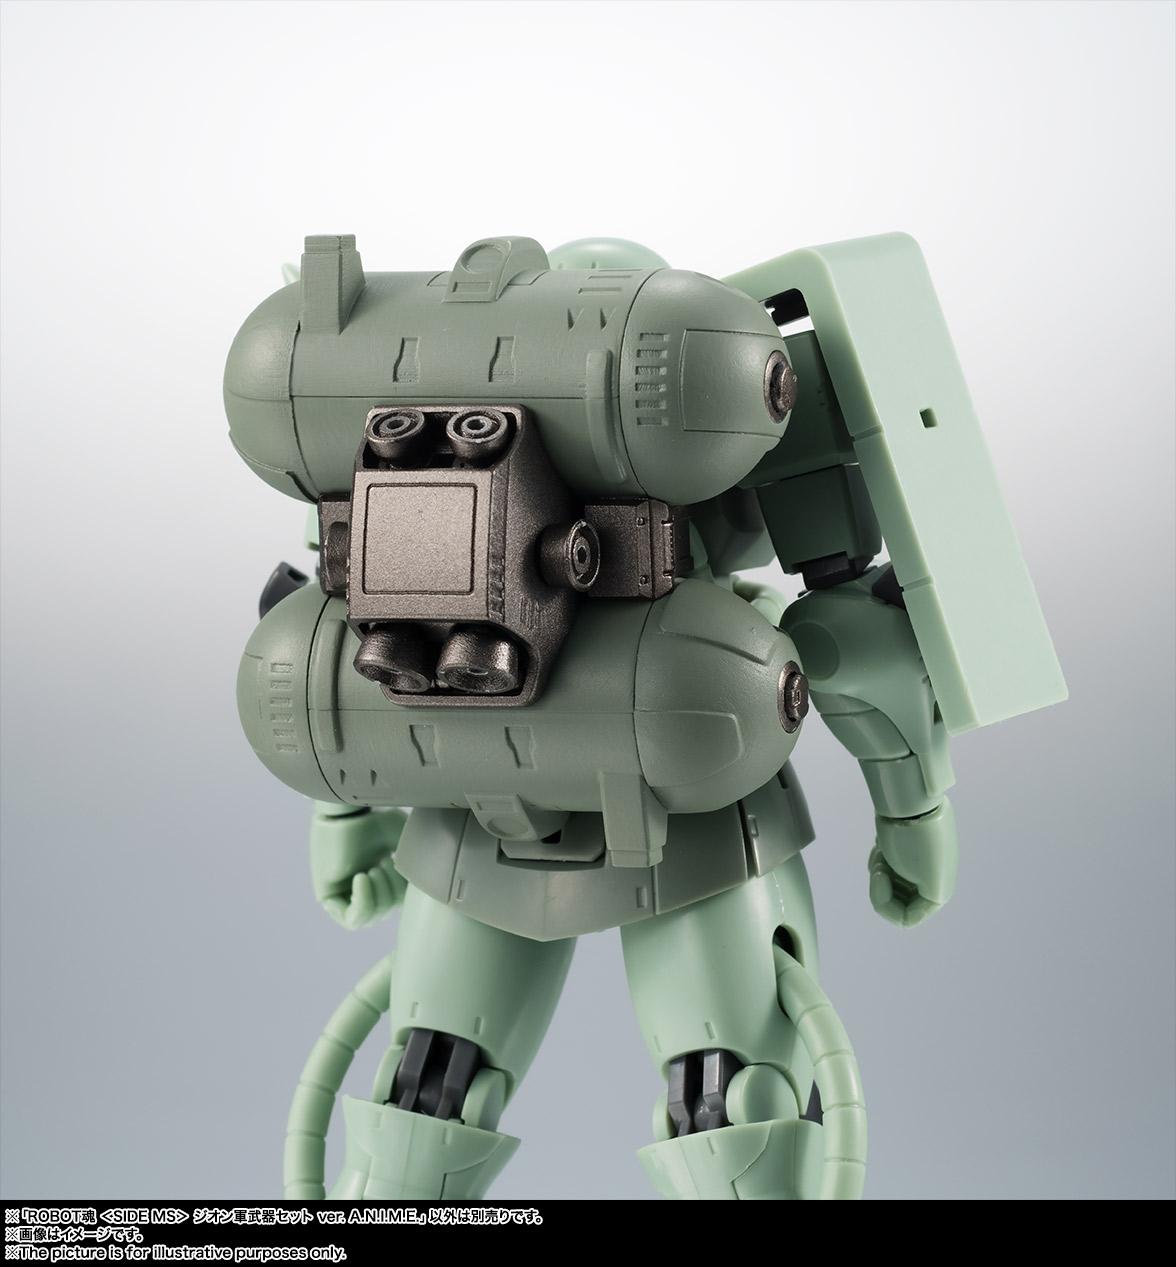 ROBOT魂〈SIDE MS〉 『機動戦士ガンダム』 ジオン軍武器セット ver. A.N.I.M.E.